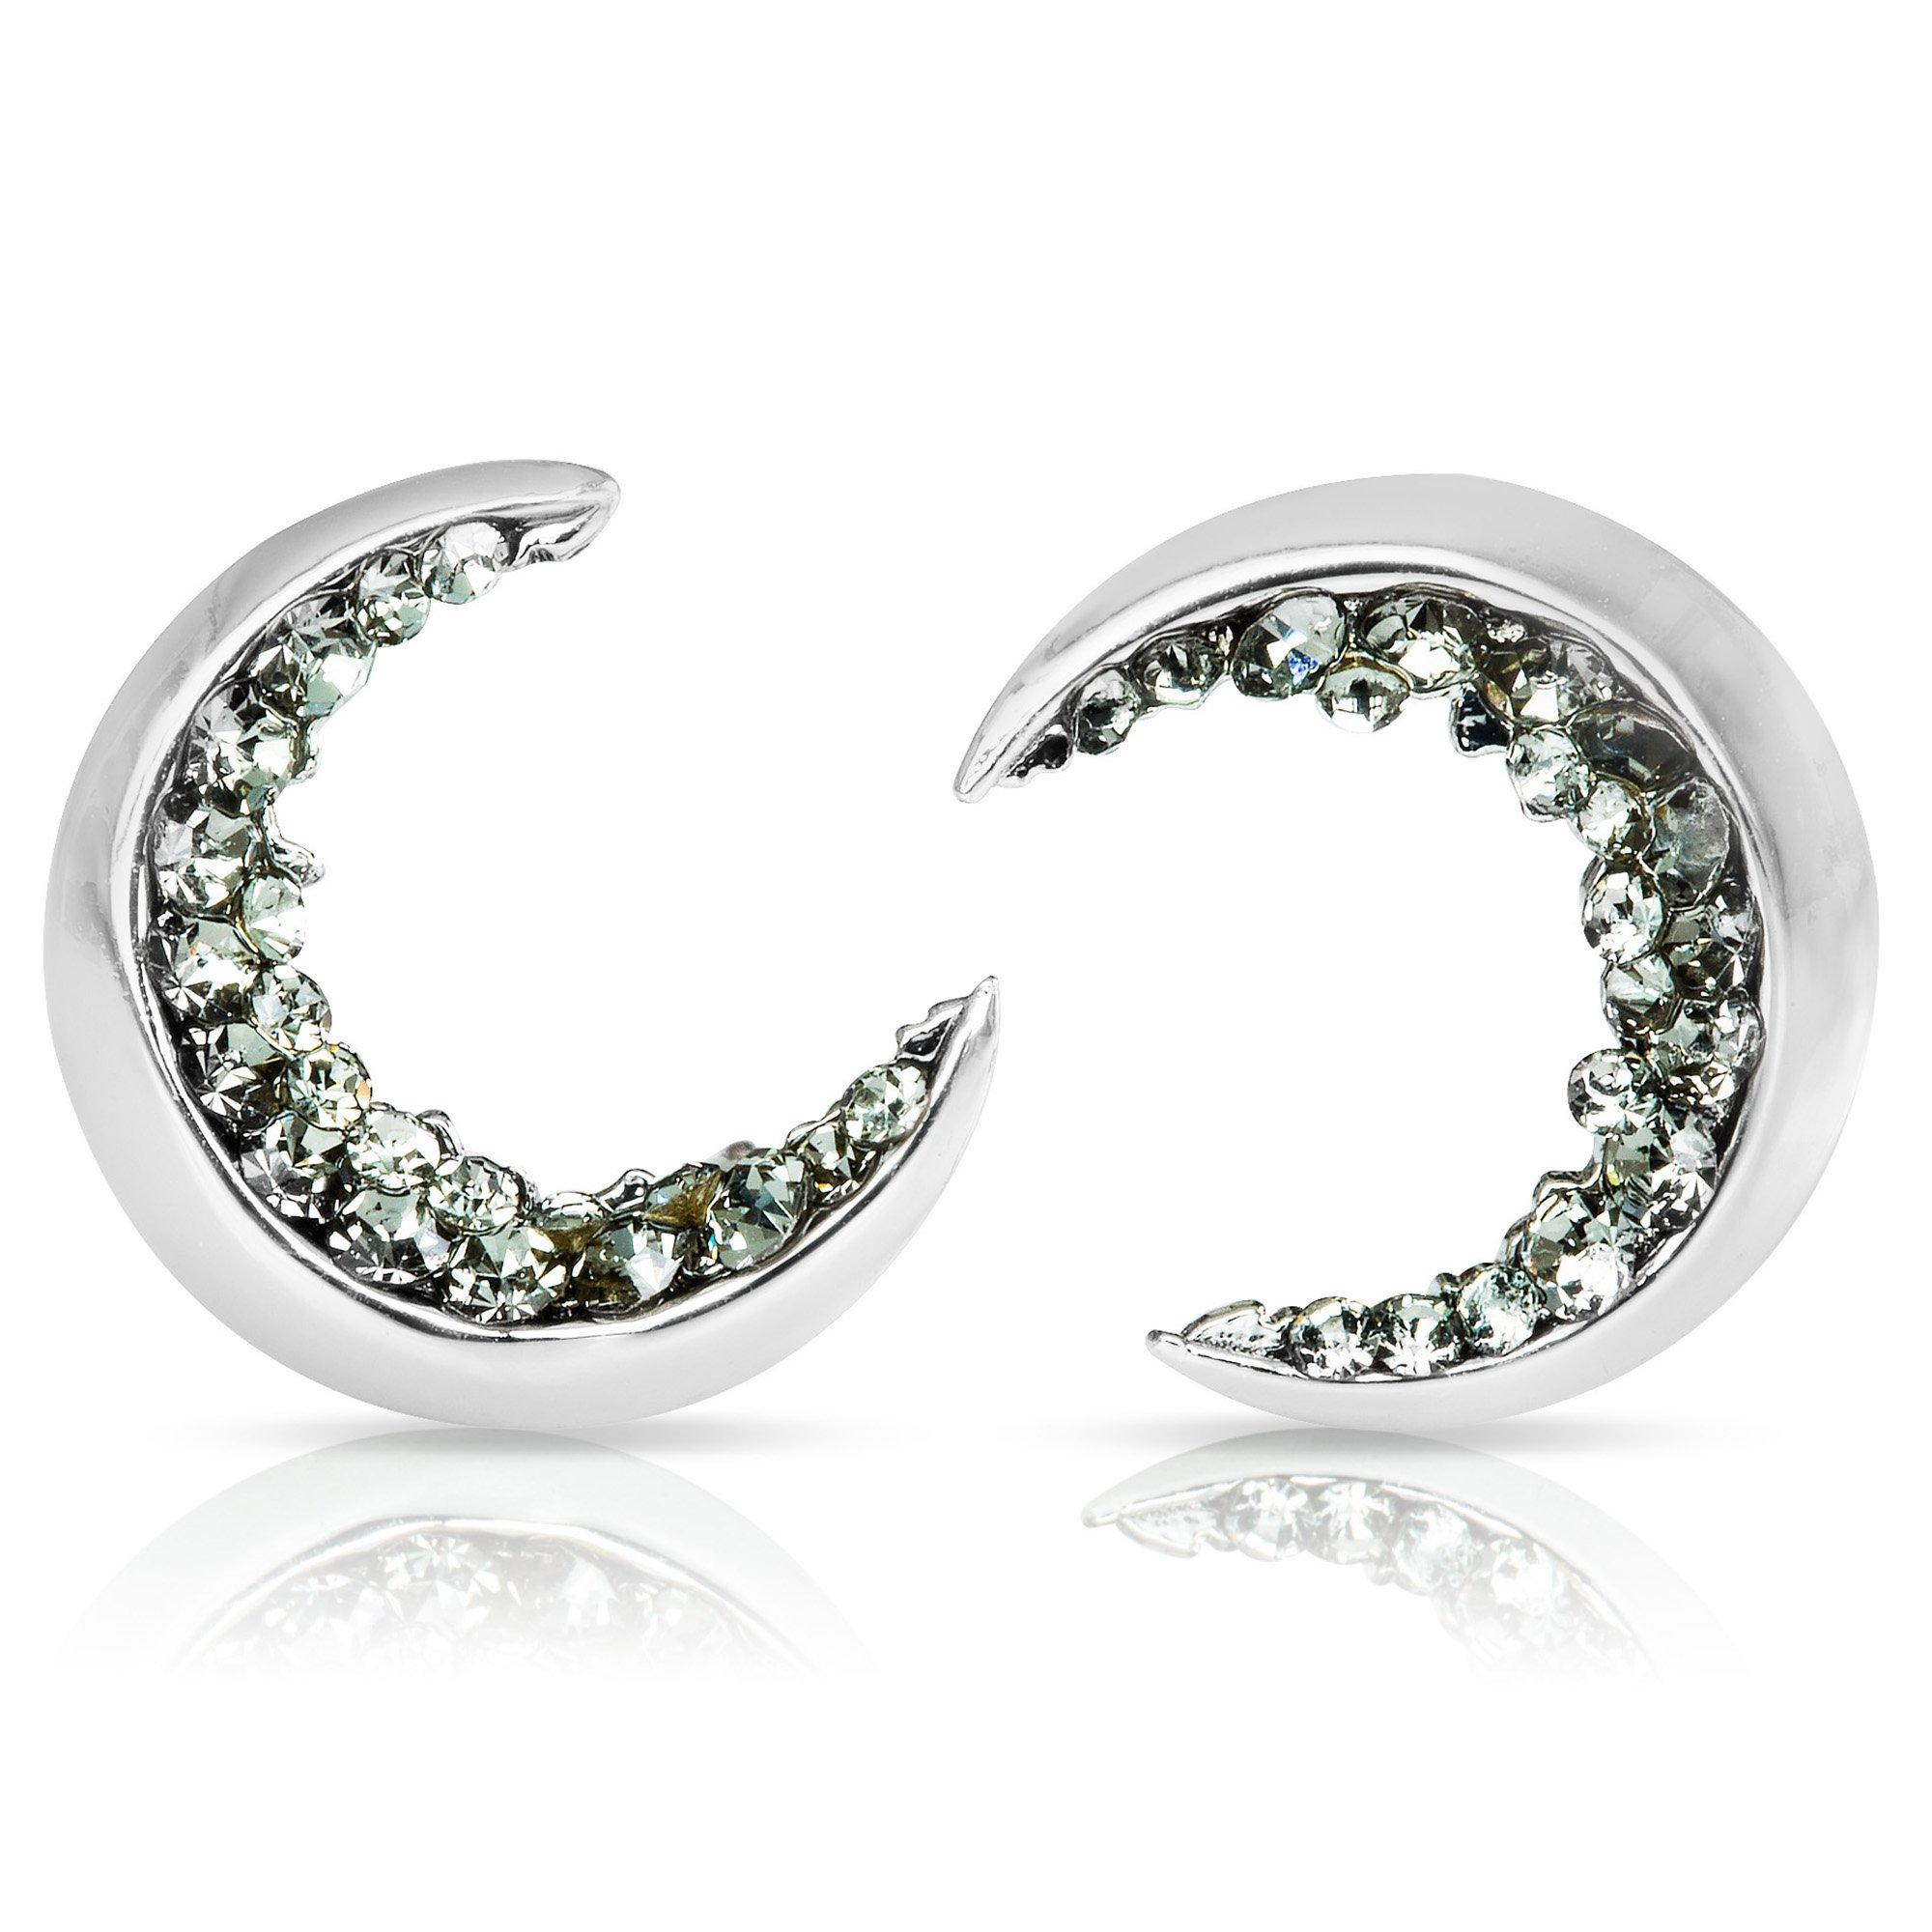 ONDAISY 20G 14K Rhodium Plated Black Cz Boho Gypsy Planet Half Sun Crescent Sailor Luna Moon Ear Studs Piercing Earrings